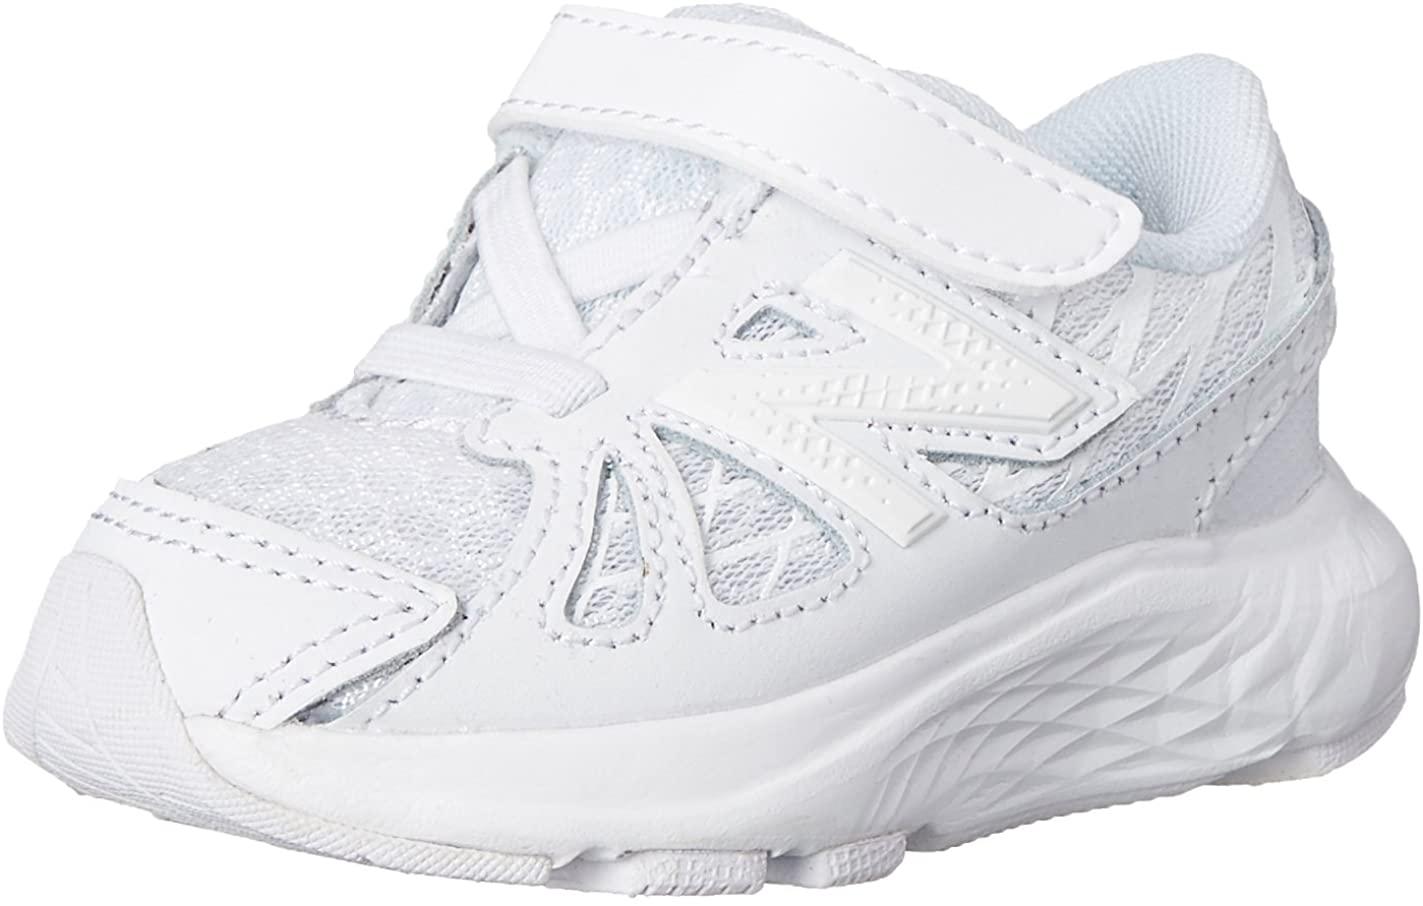 New Balance KV690I Uniform Running Shoe (Infant/Toddler)